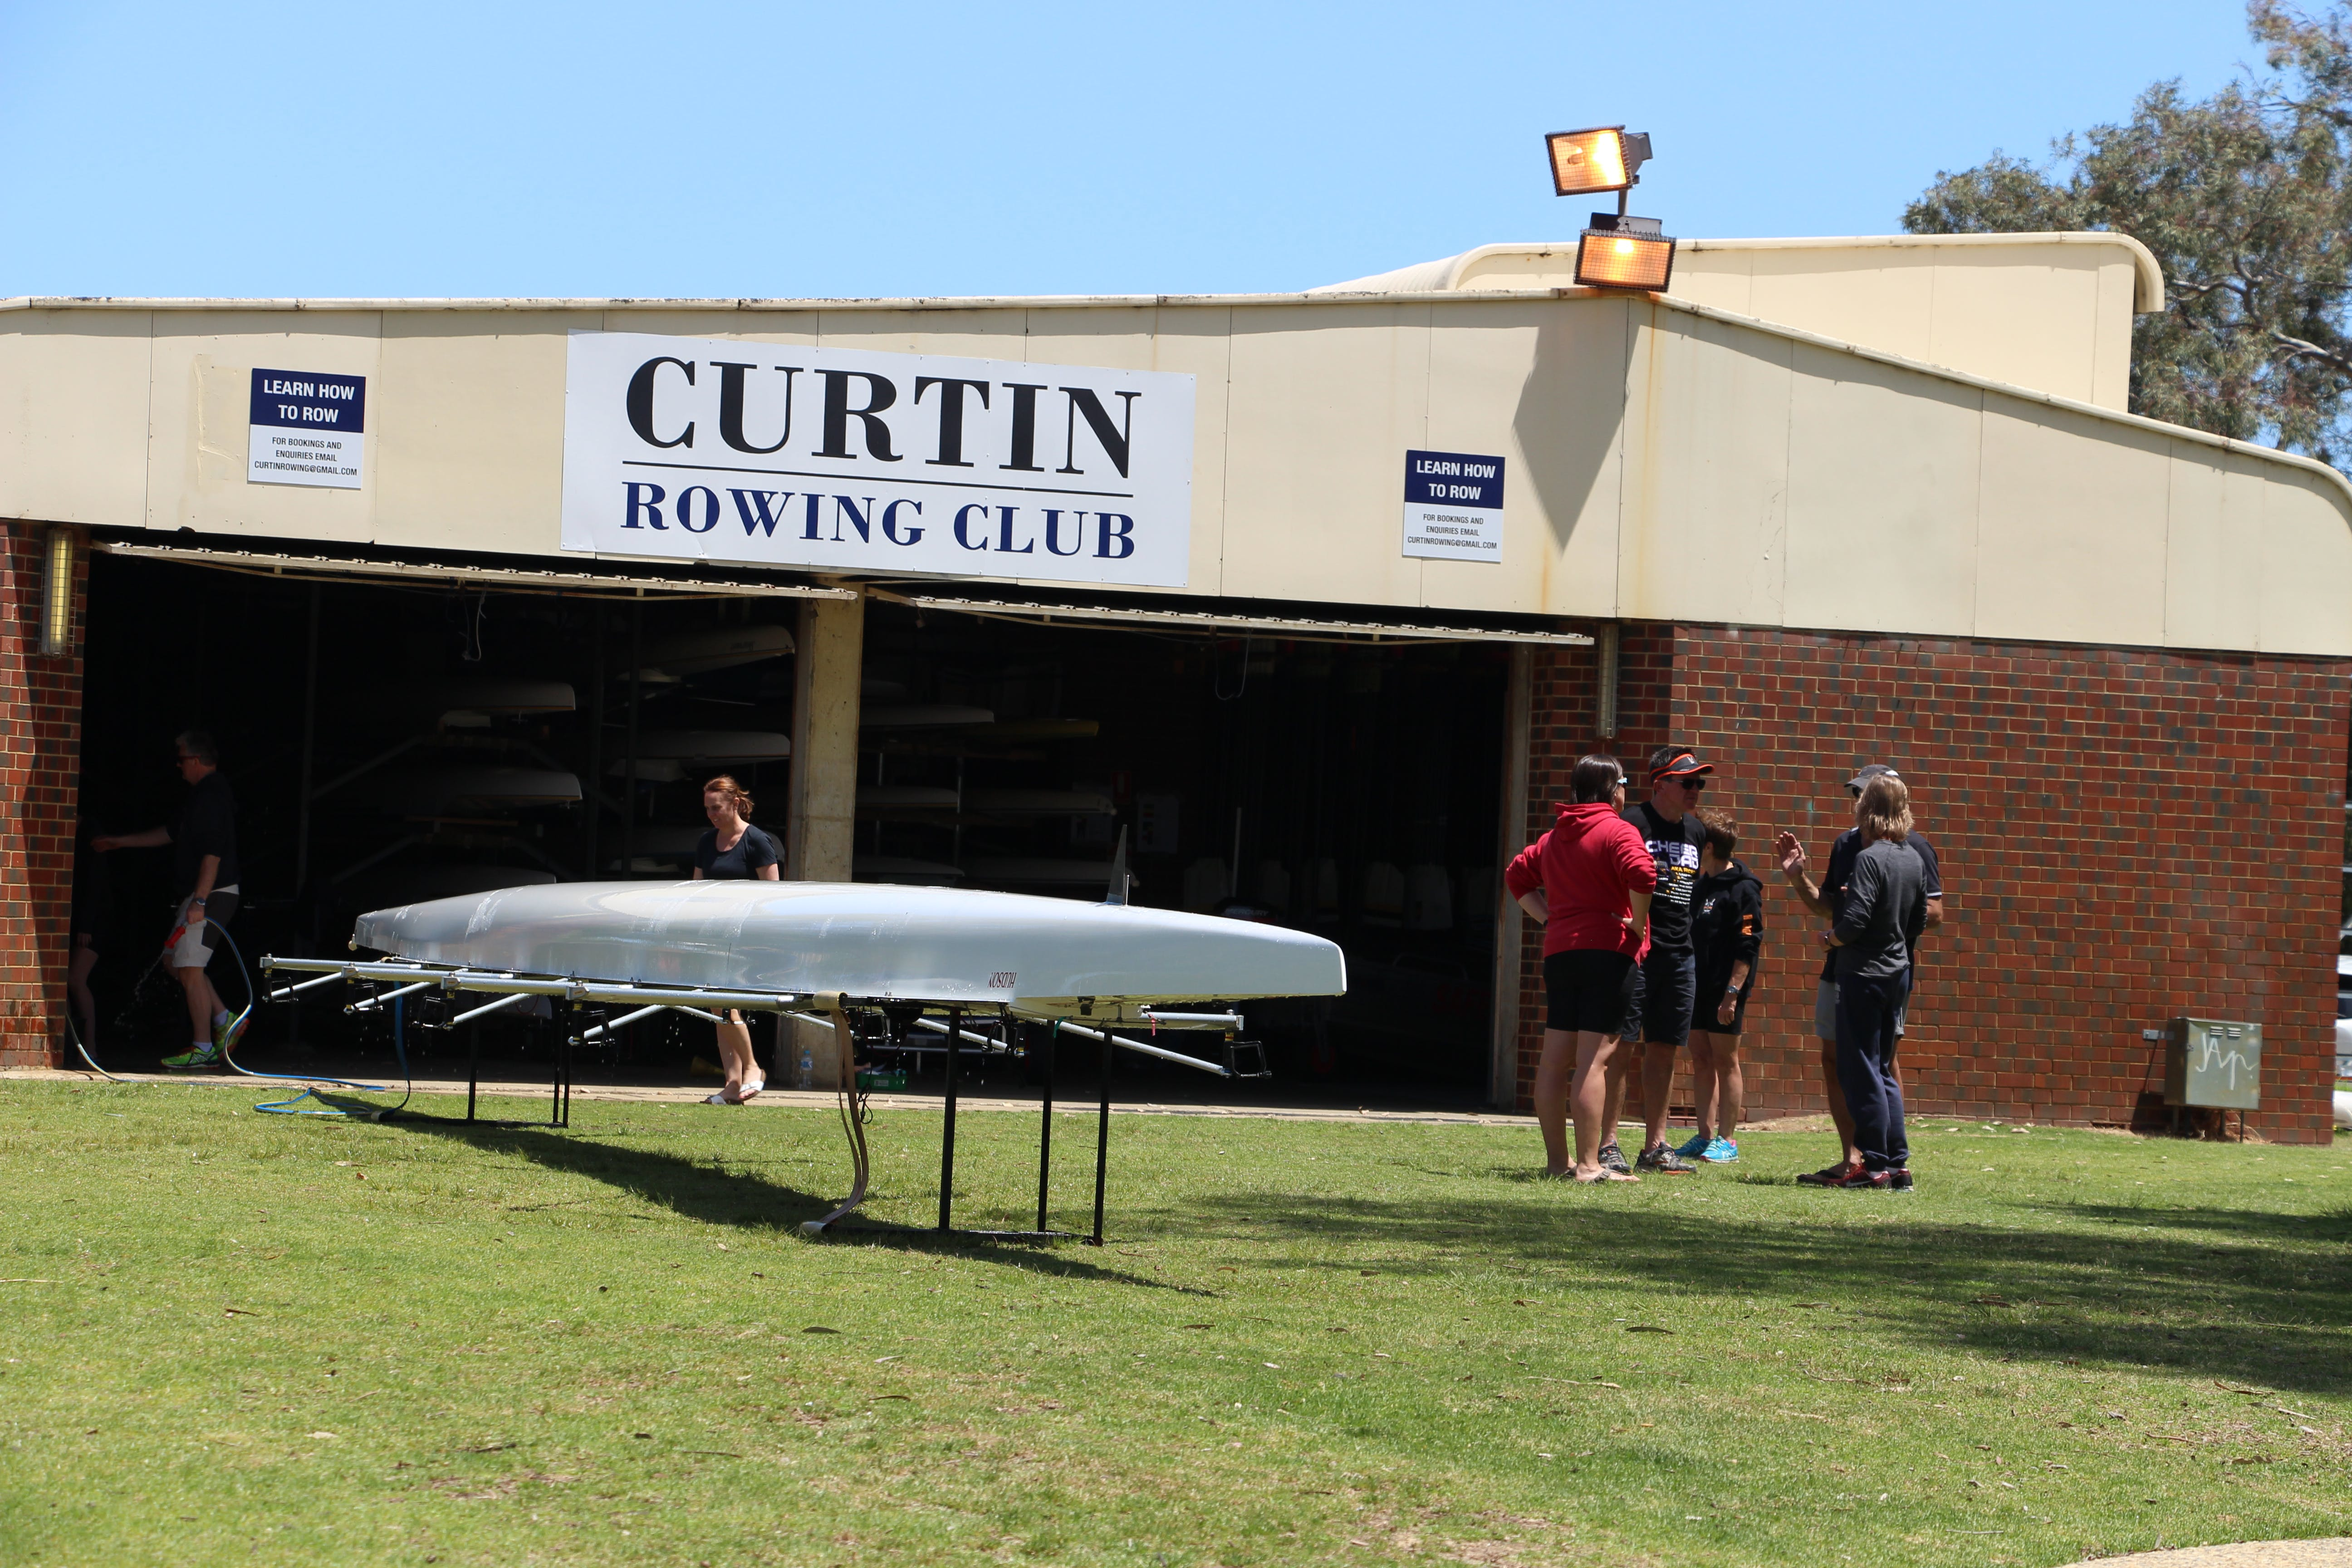 Curtin Rowing Club